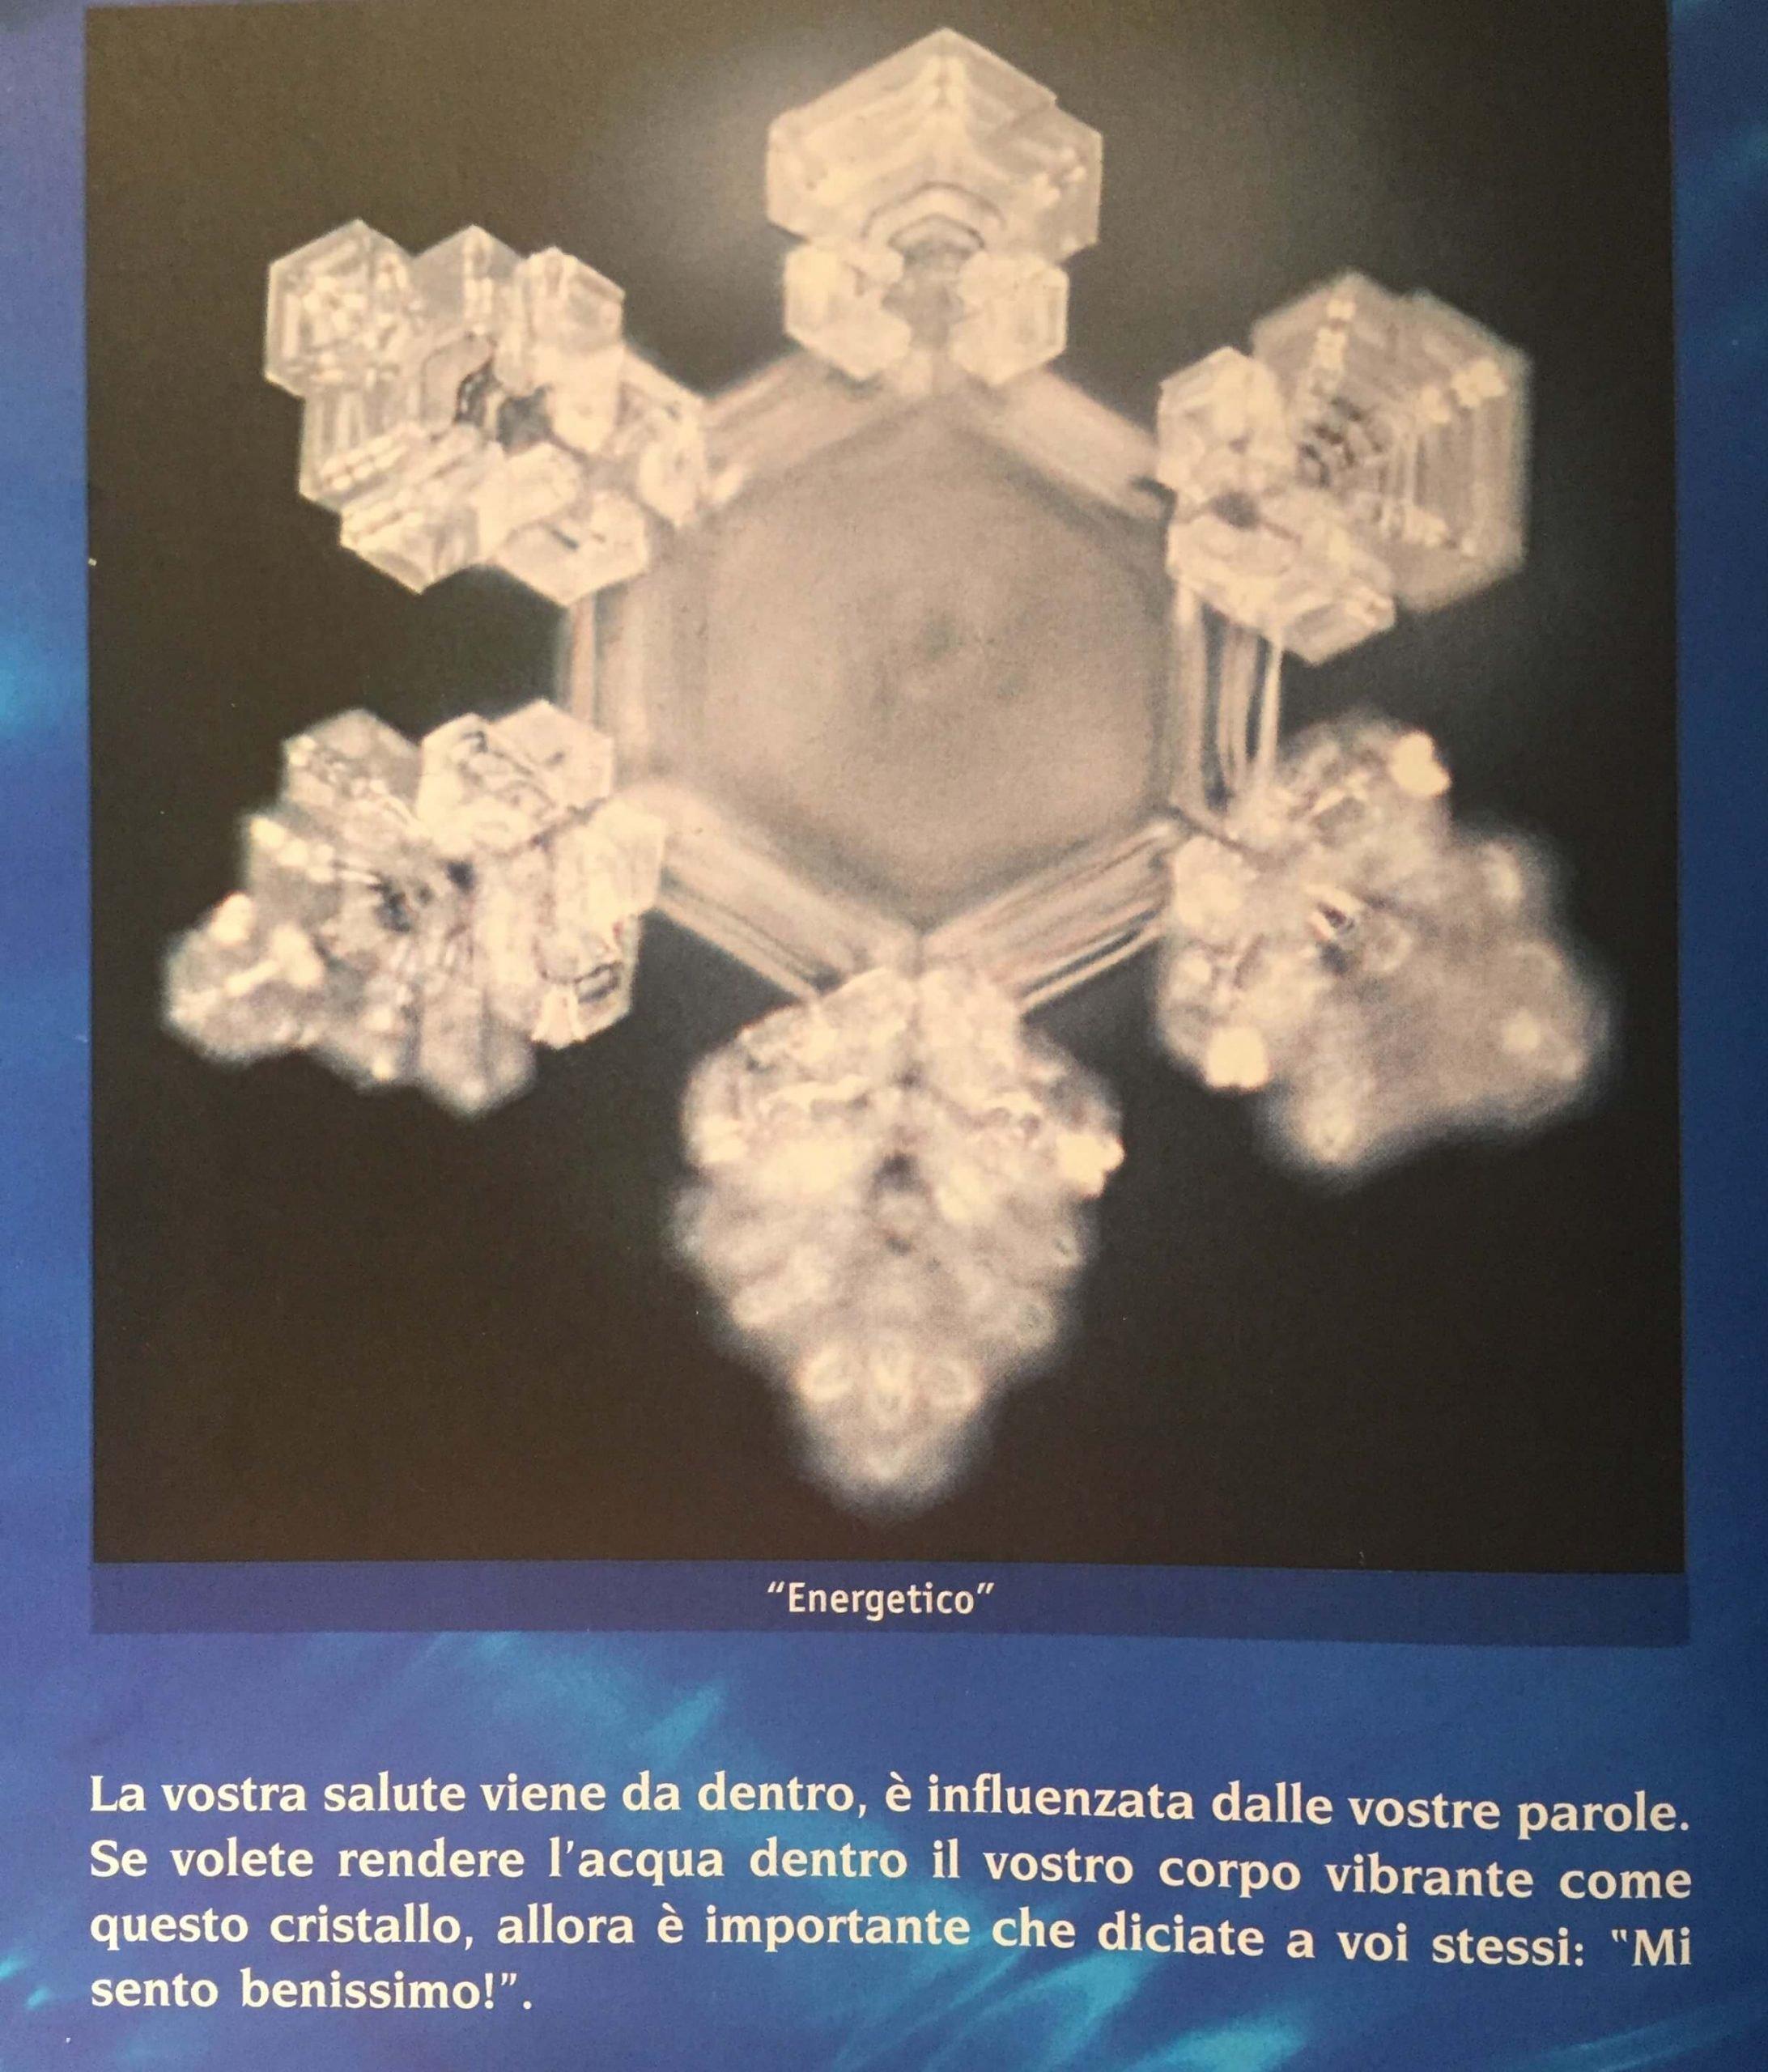 cristallo Emoto Energetico